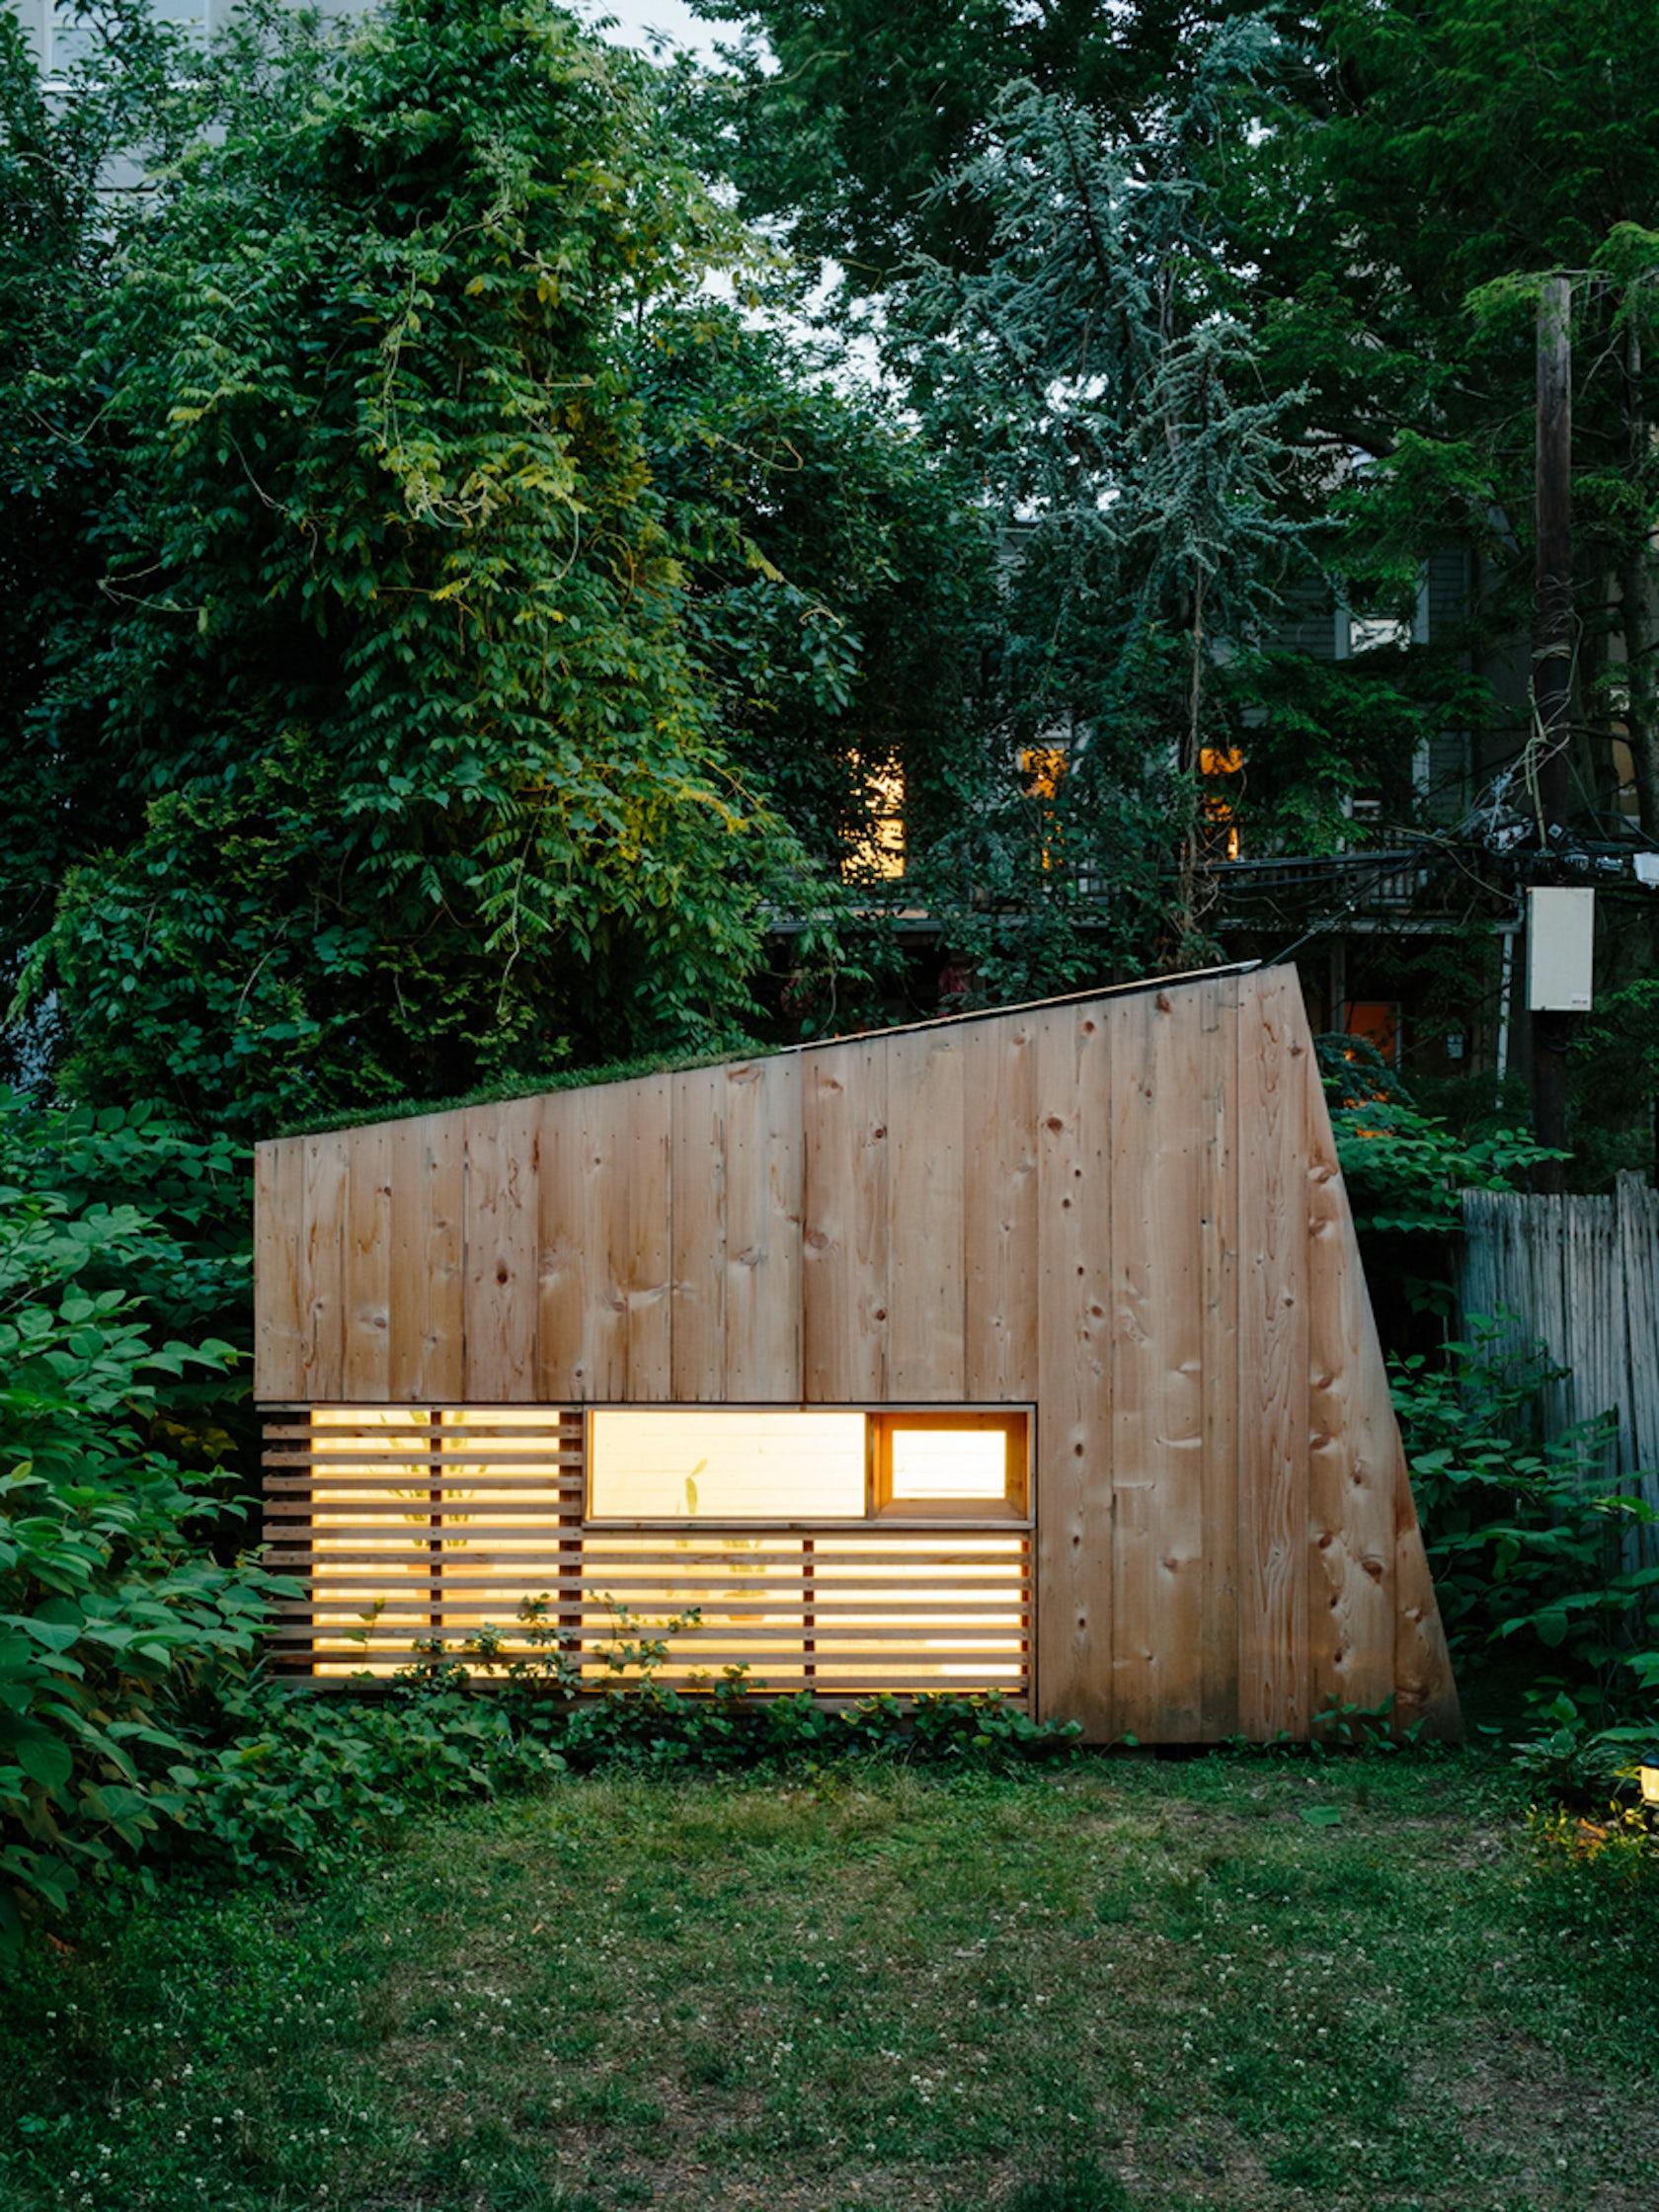 The Brooklyn Garden Studio